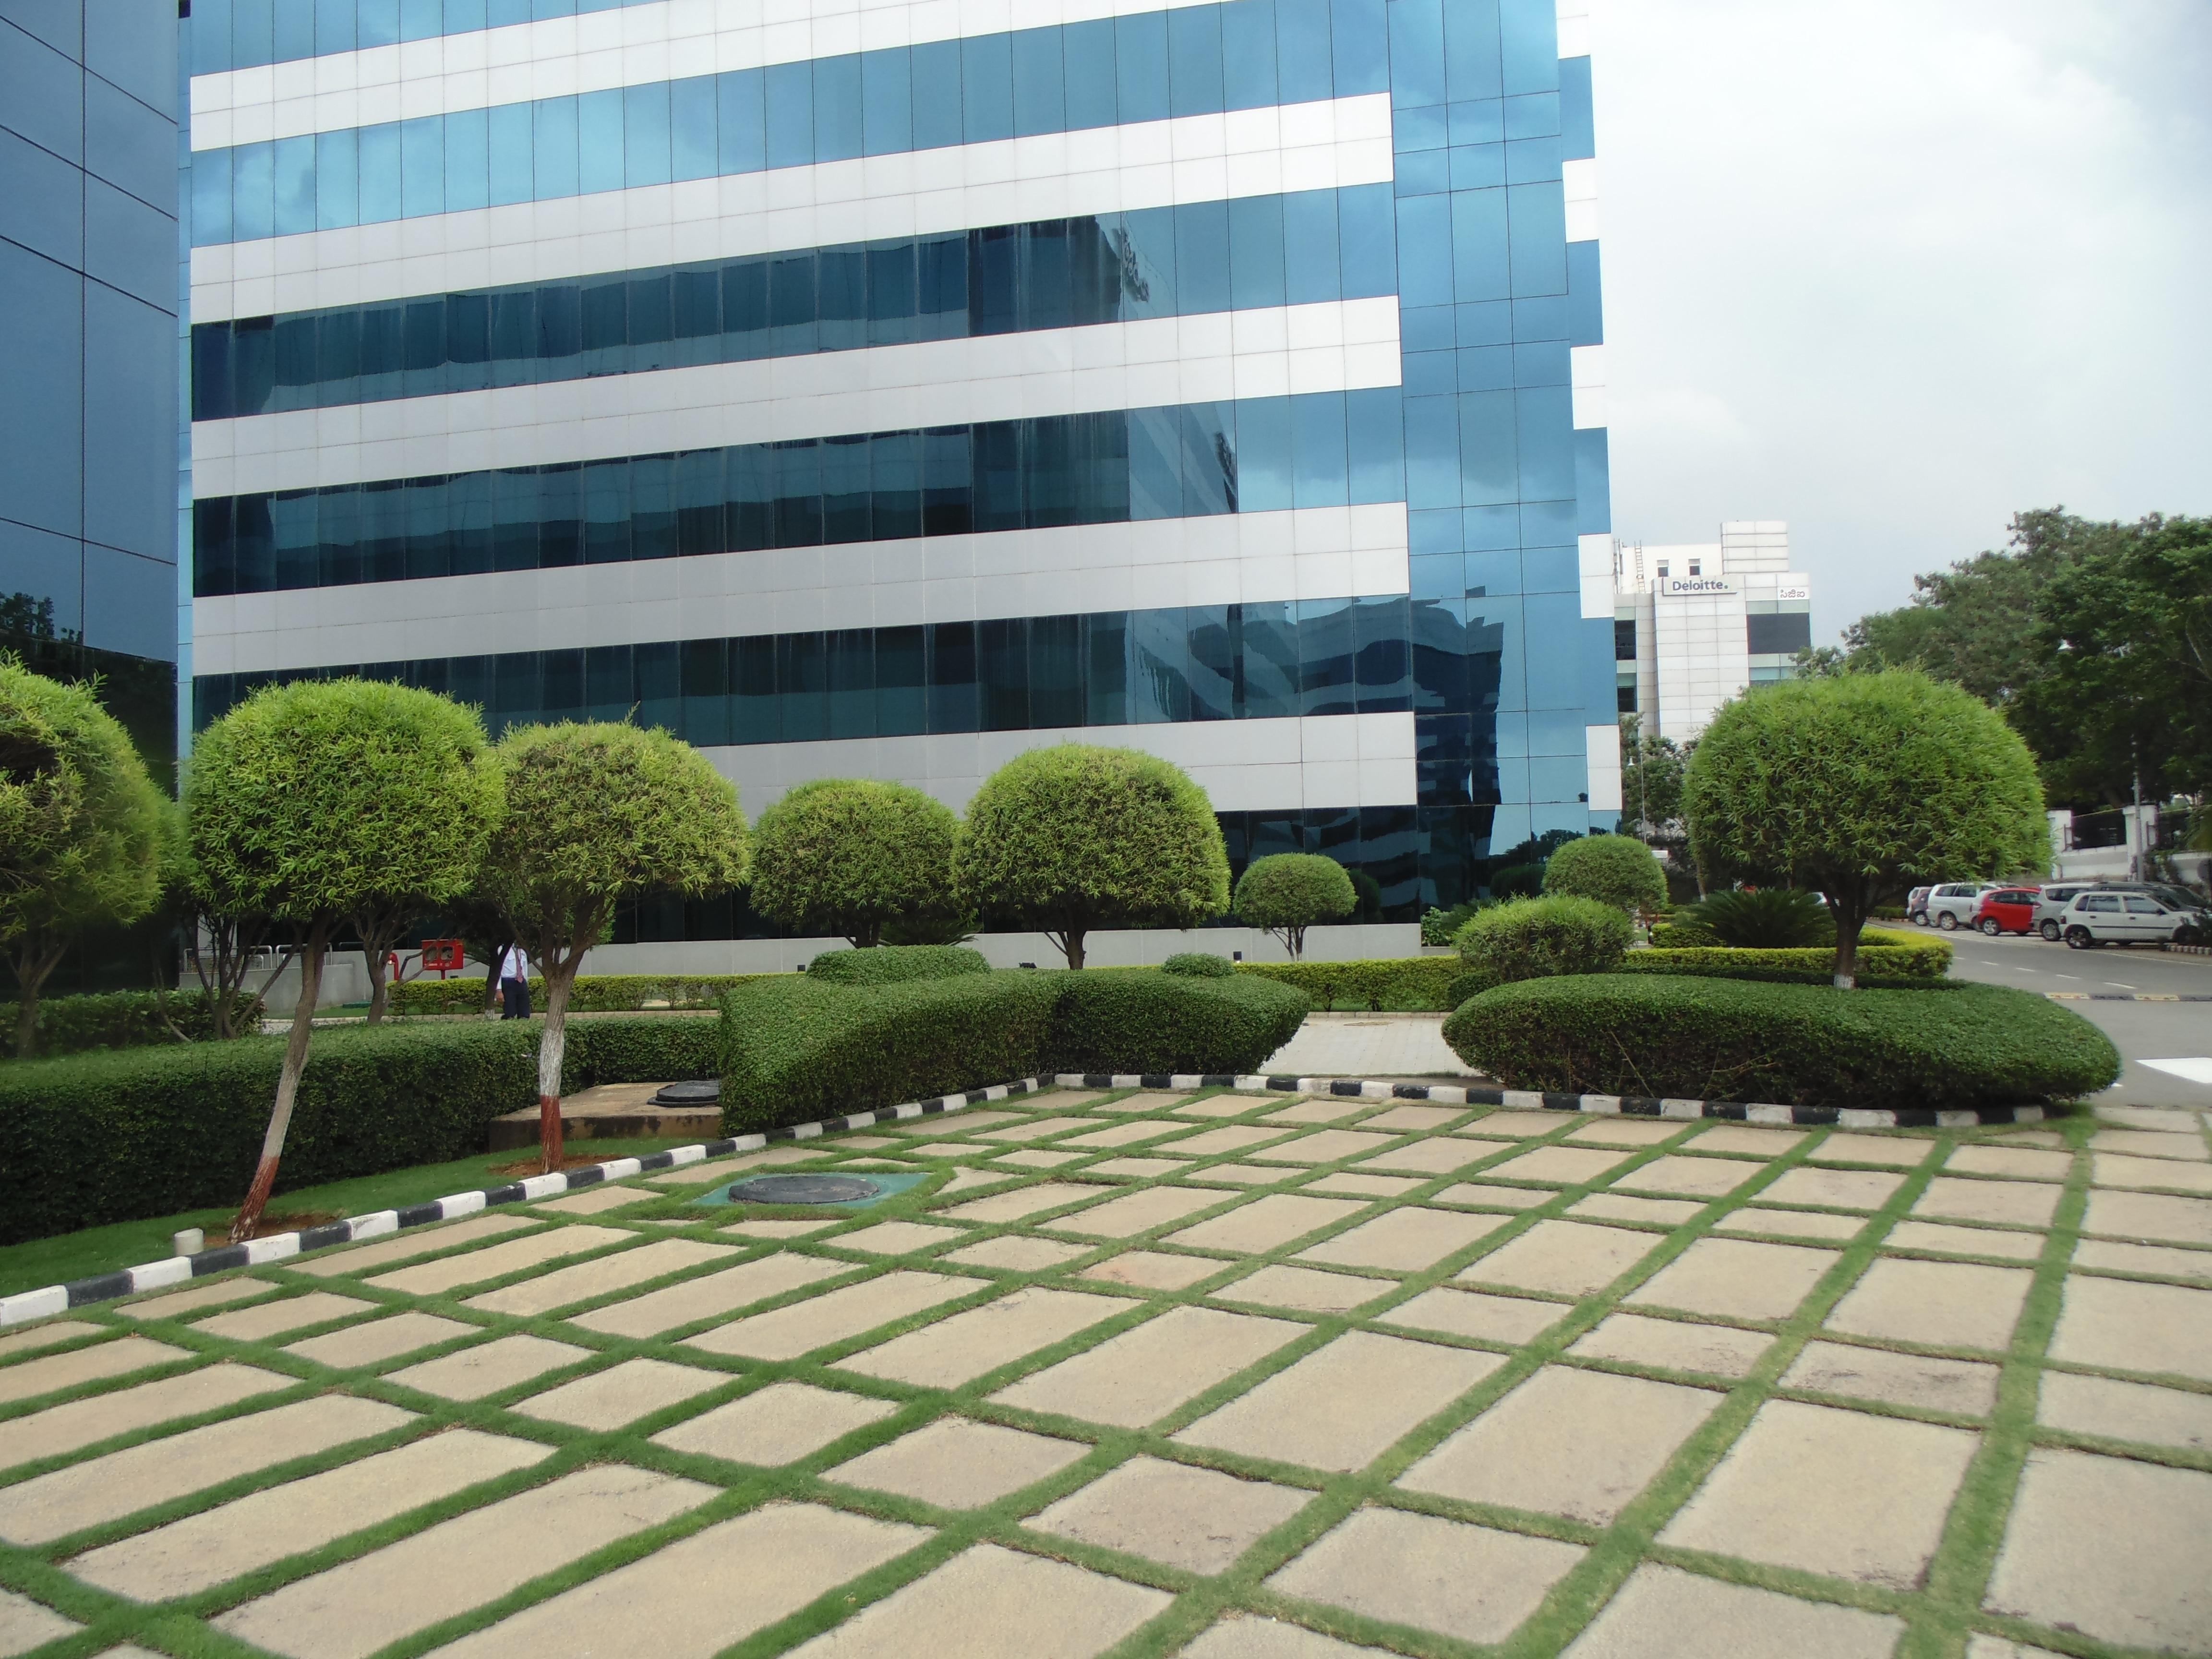 Landscape service in